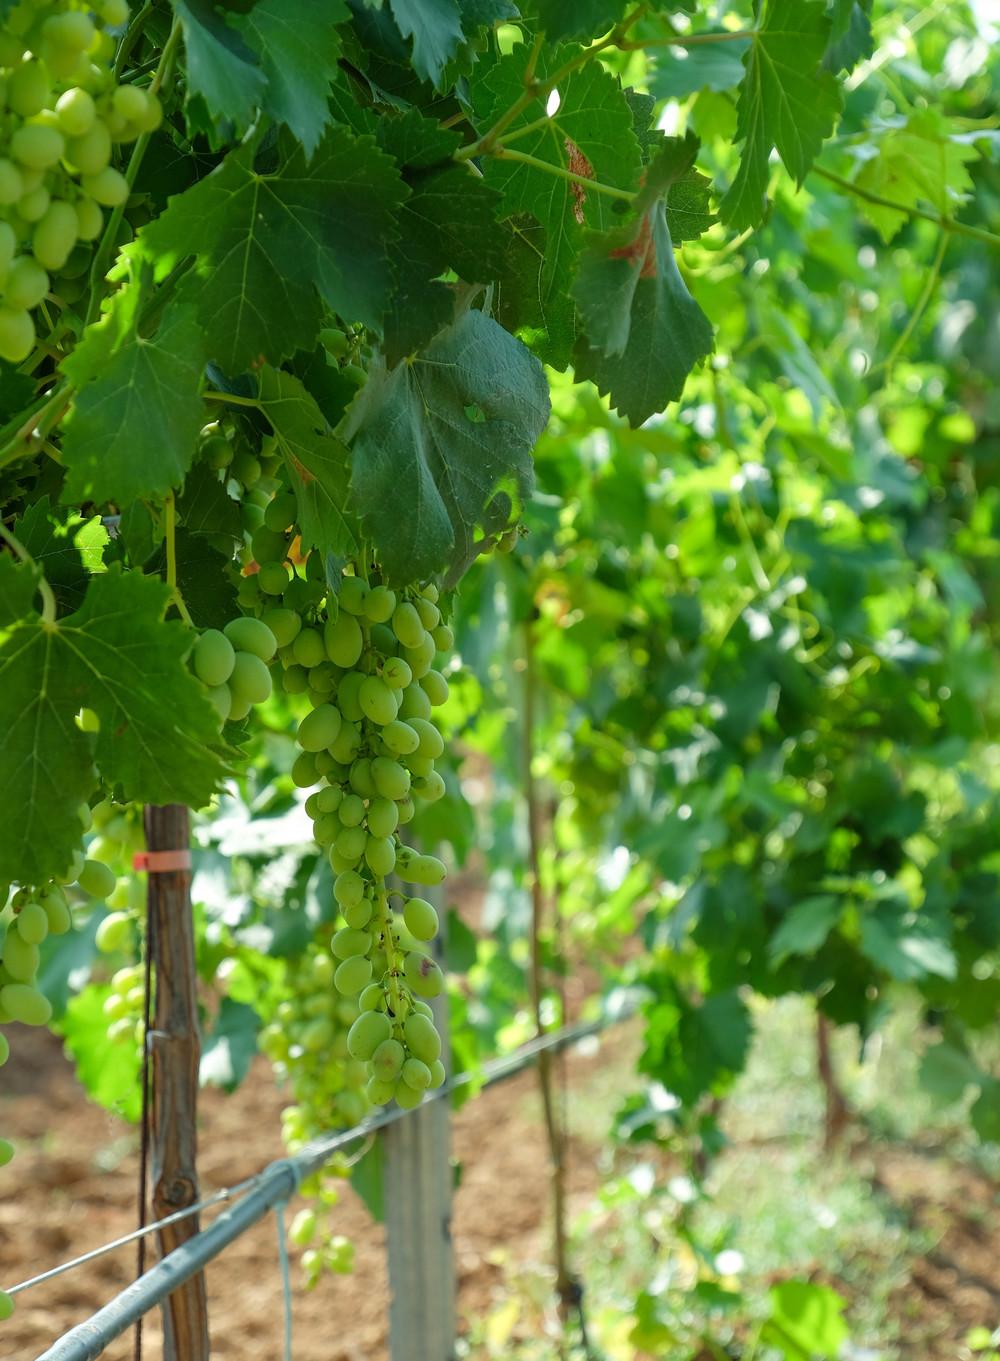 LaurenSchwaiger-Travel-Blog-Mallorca-Spain-Grapes-On-The-Vine.jpg